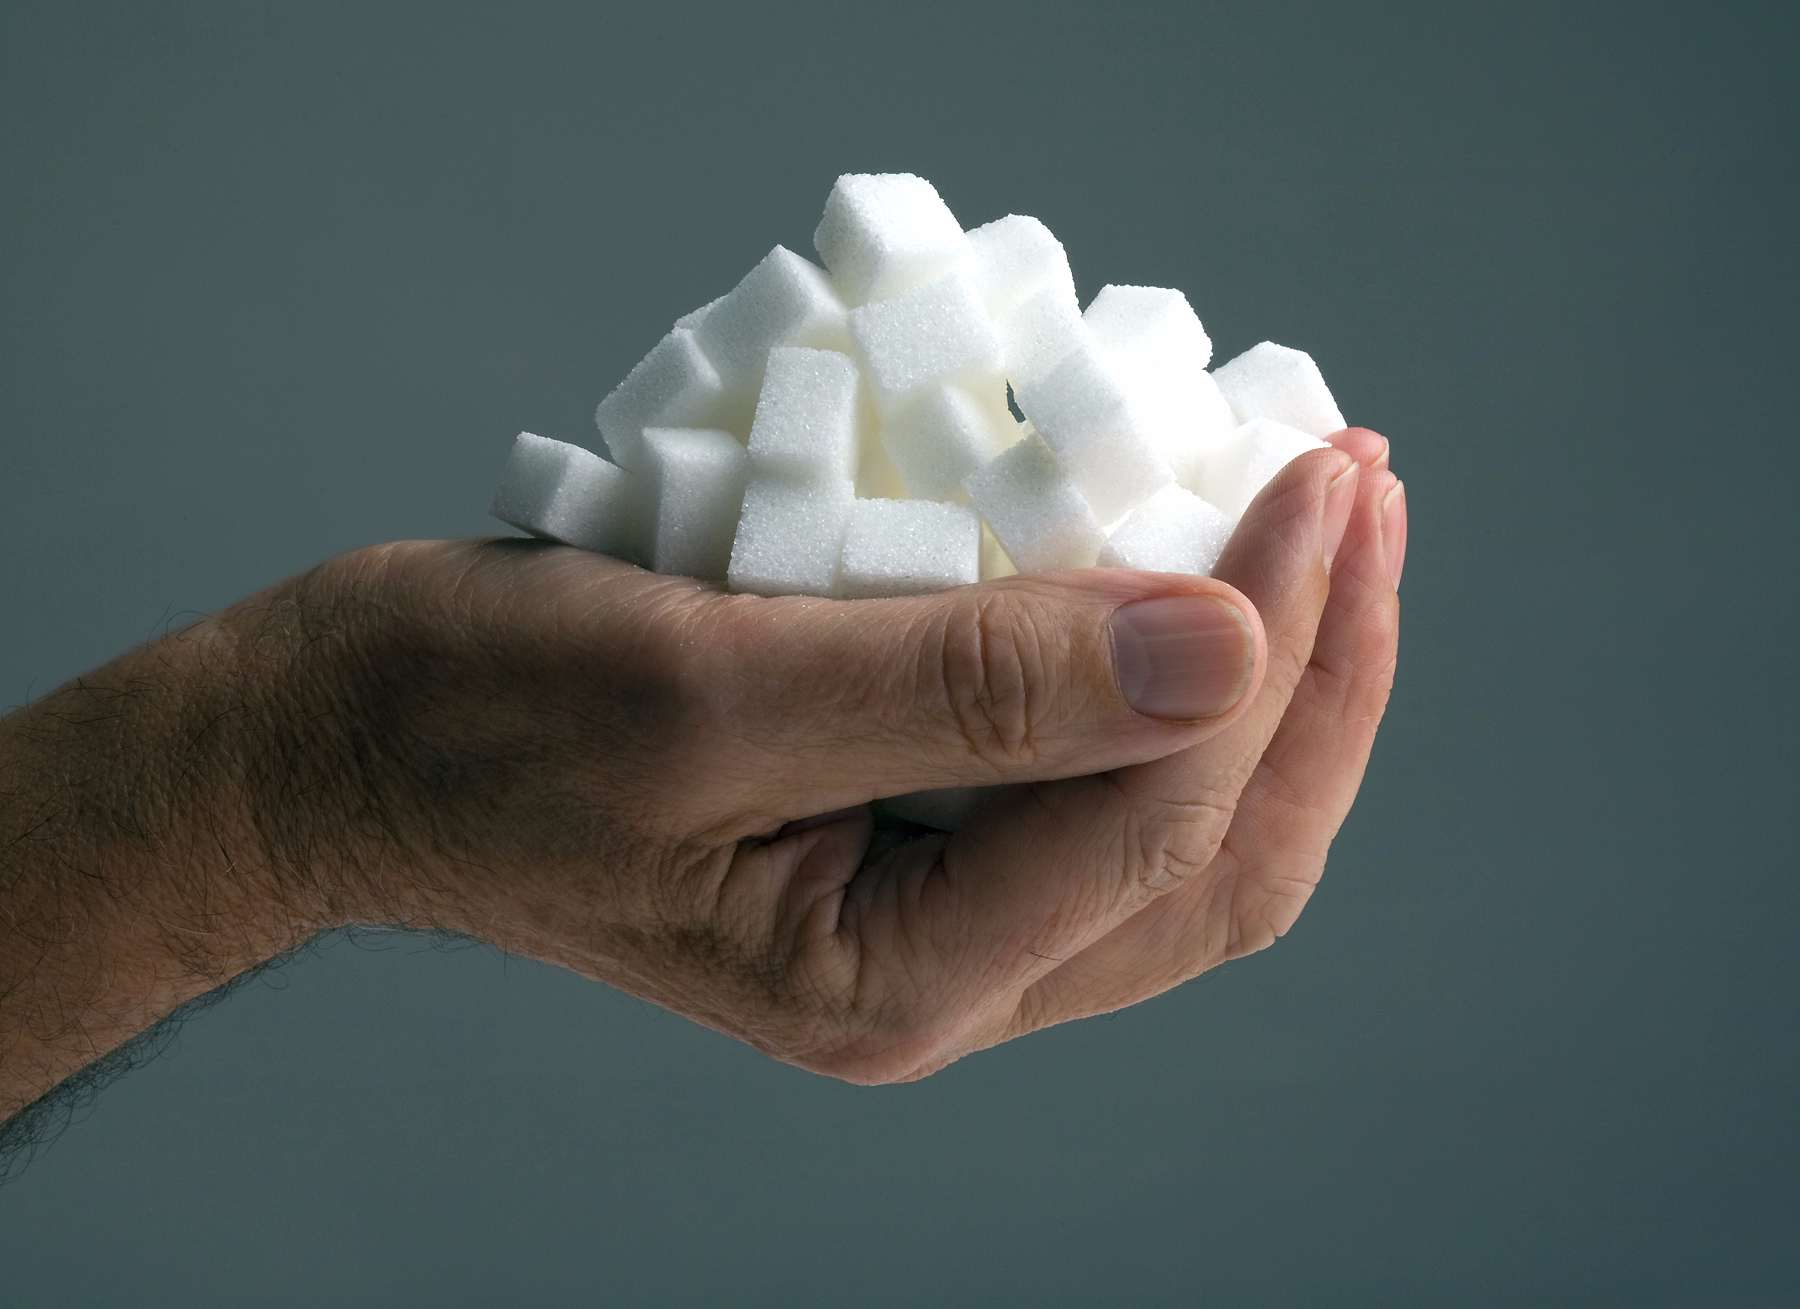 Как снизить сахар в крови в домашних условиях быстро 89